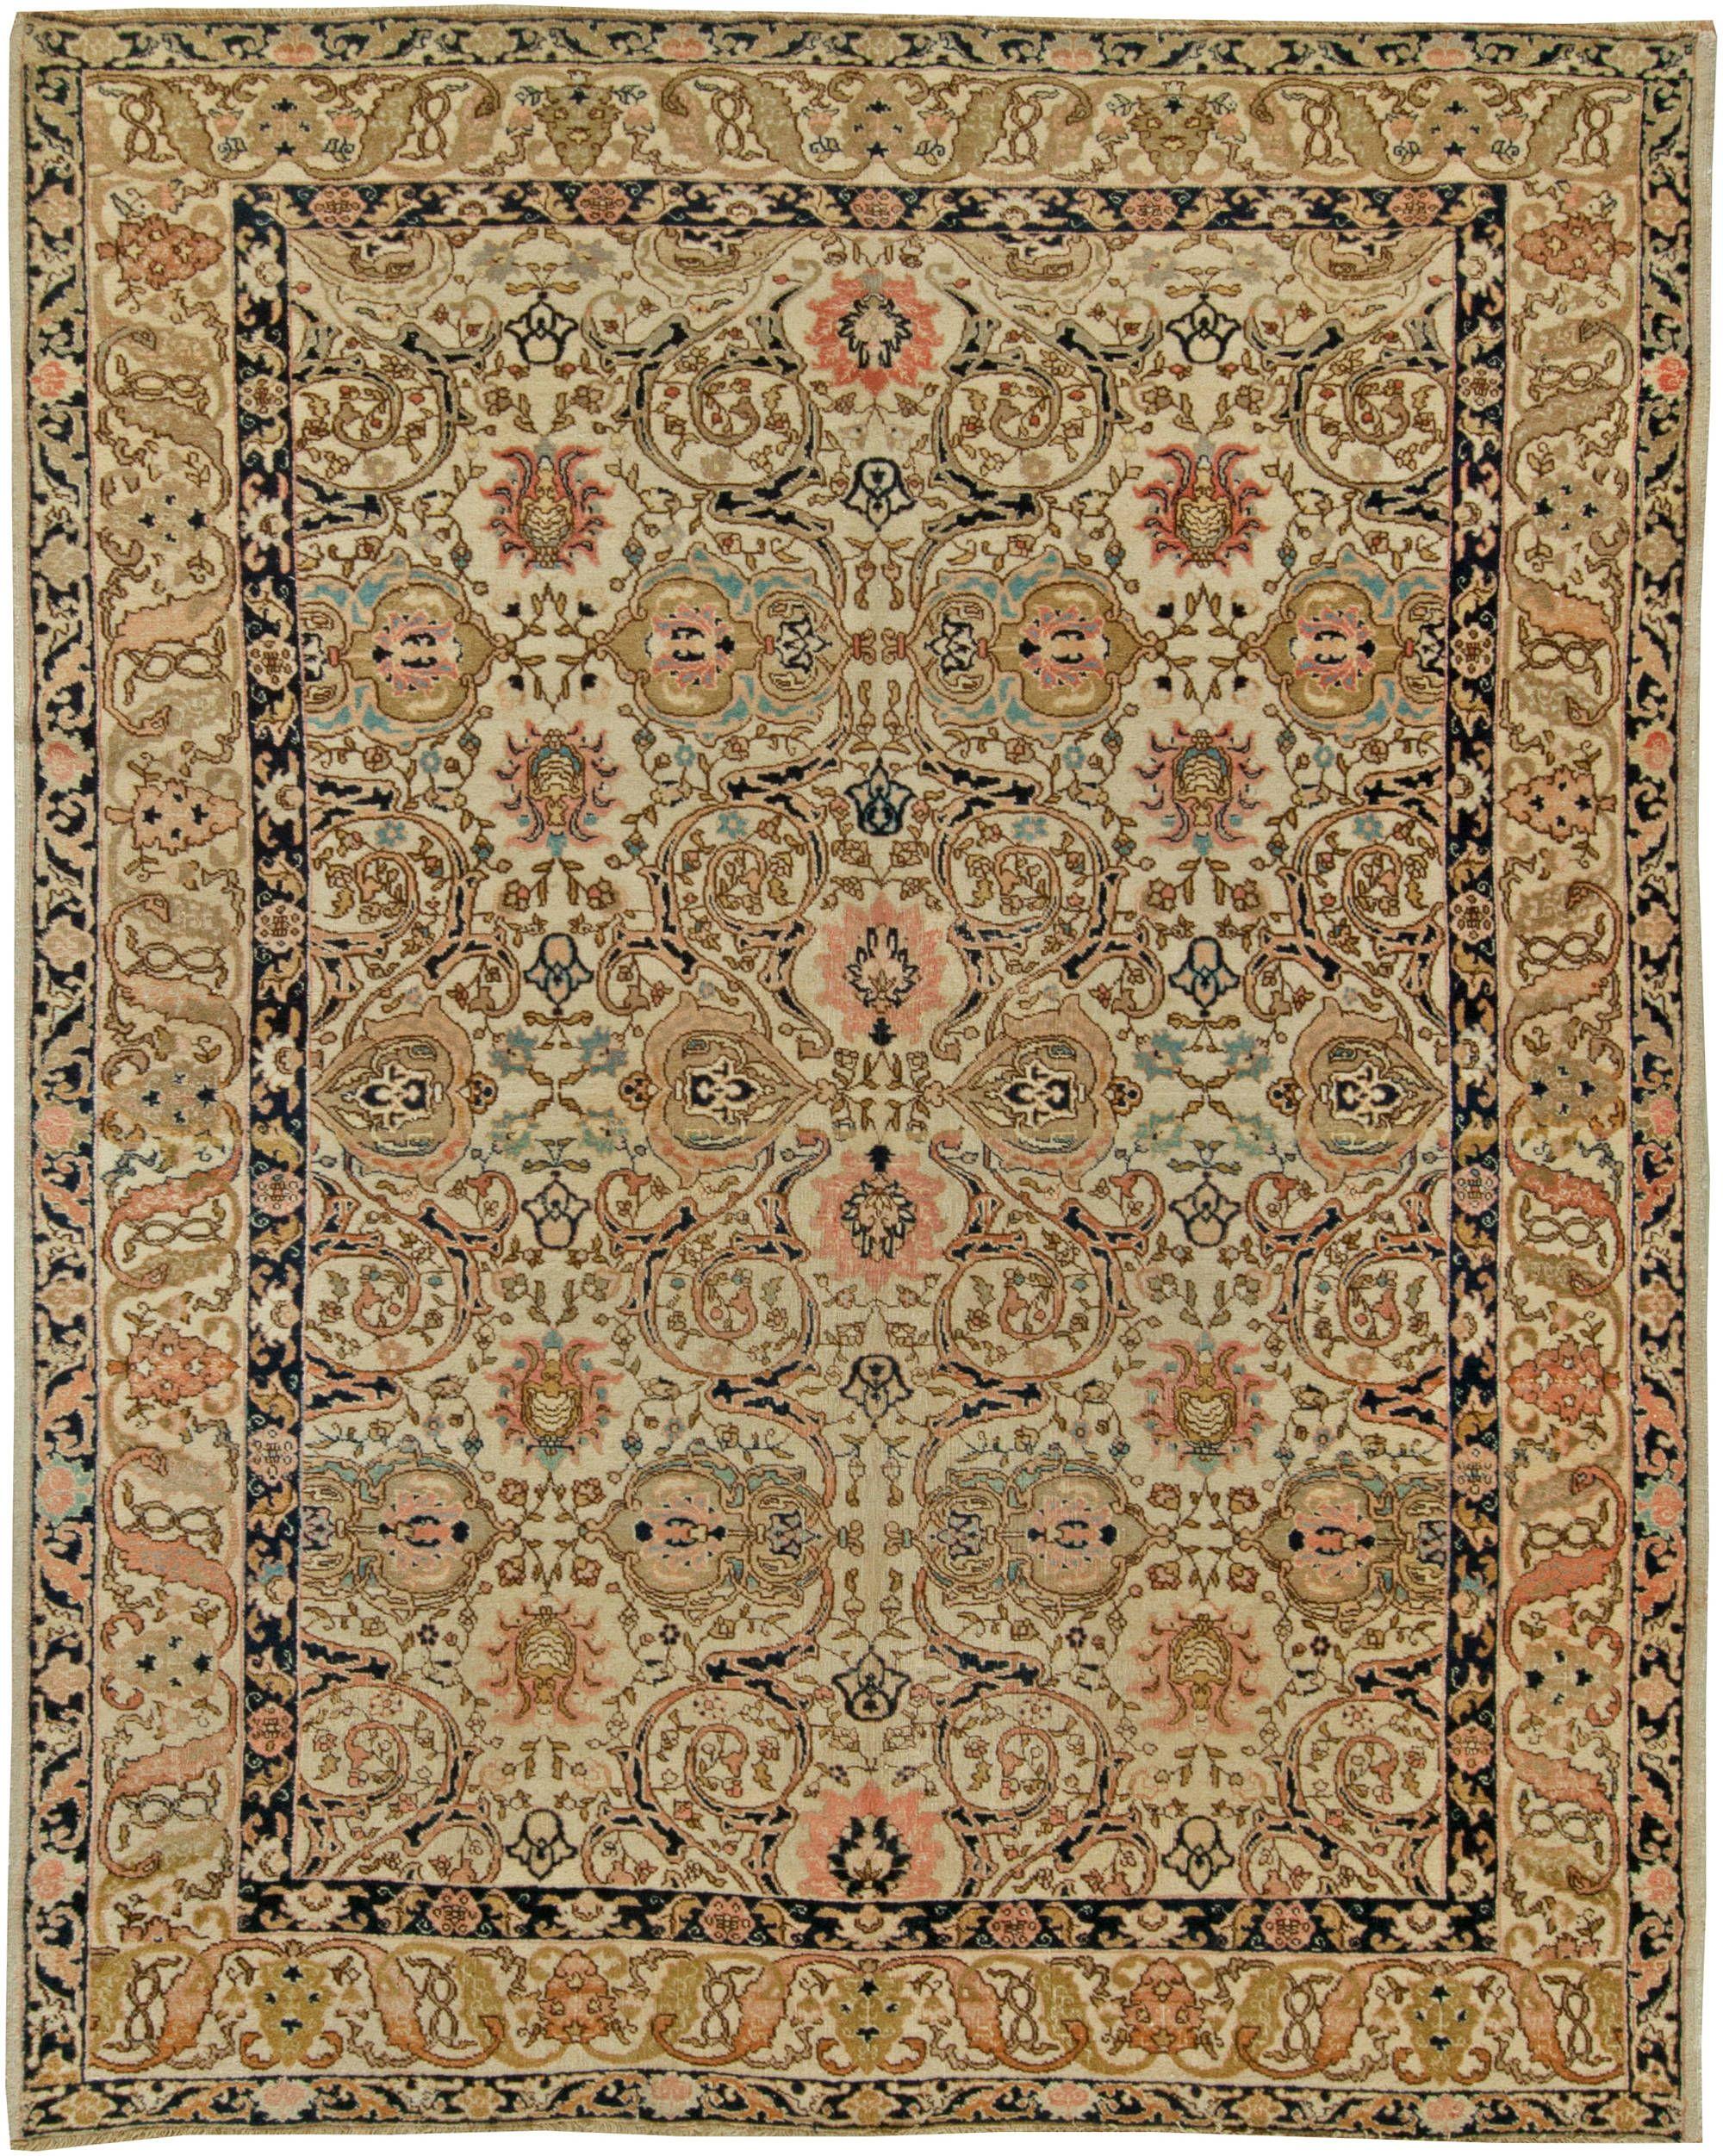 Antique Persian Tabriz Rug Bb6097 By Doris Leslie Blau